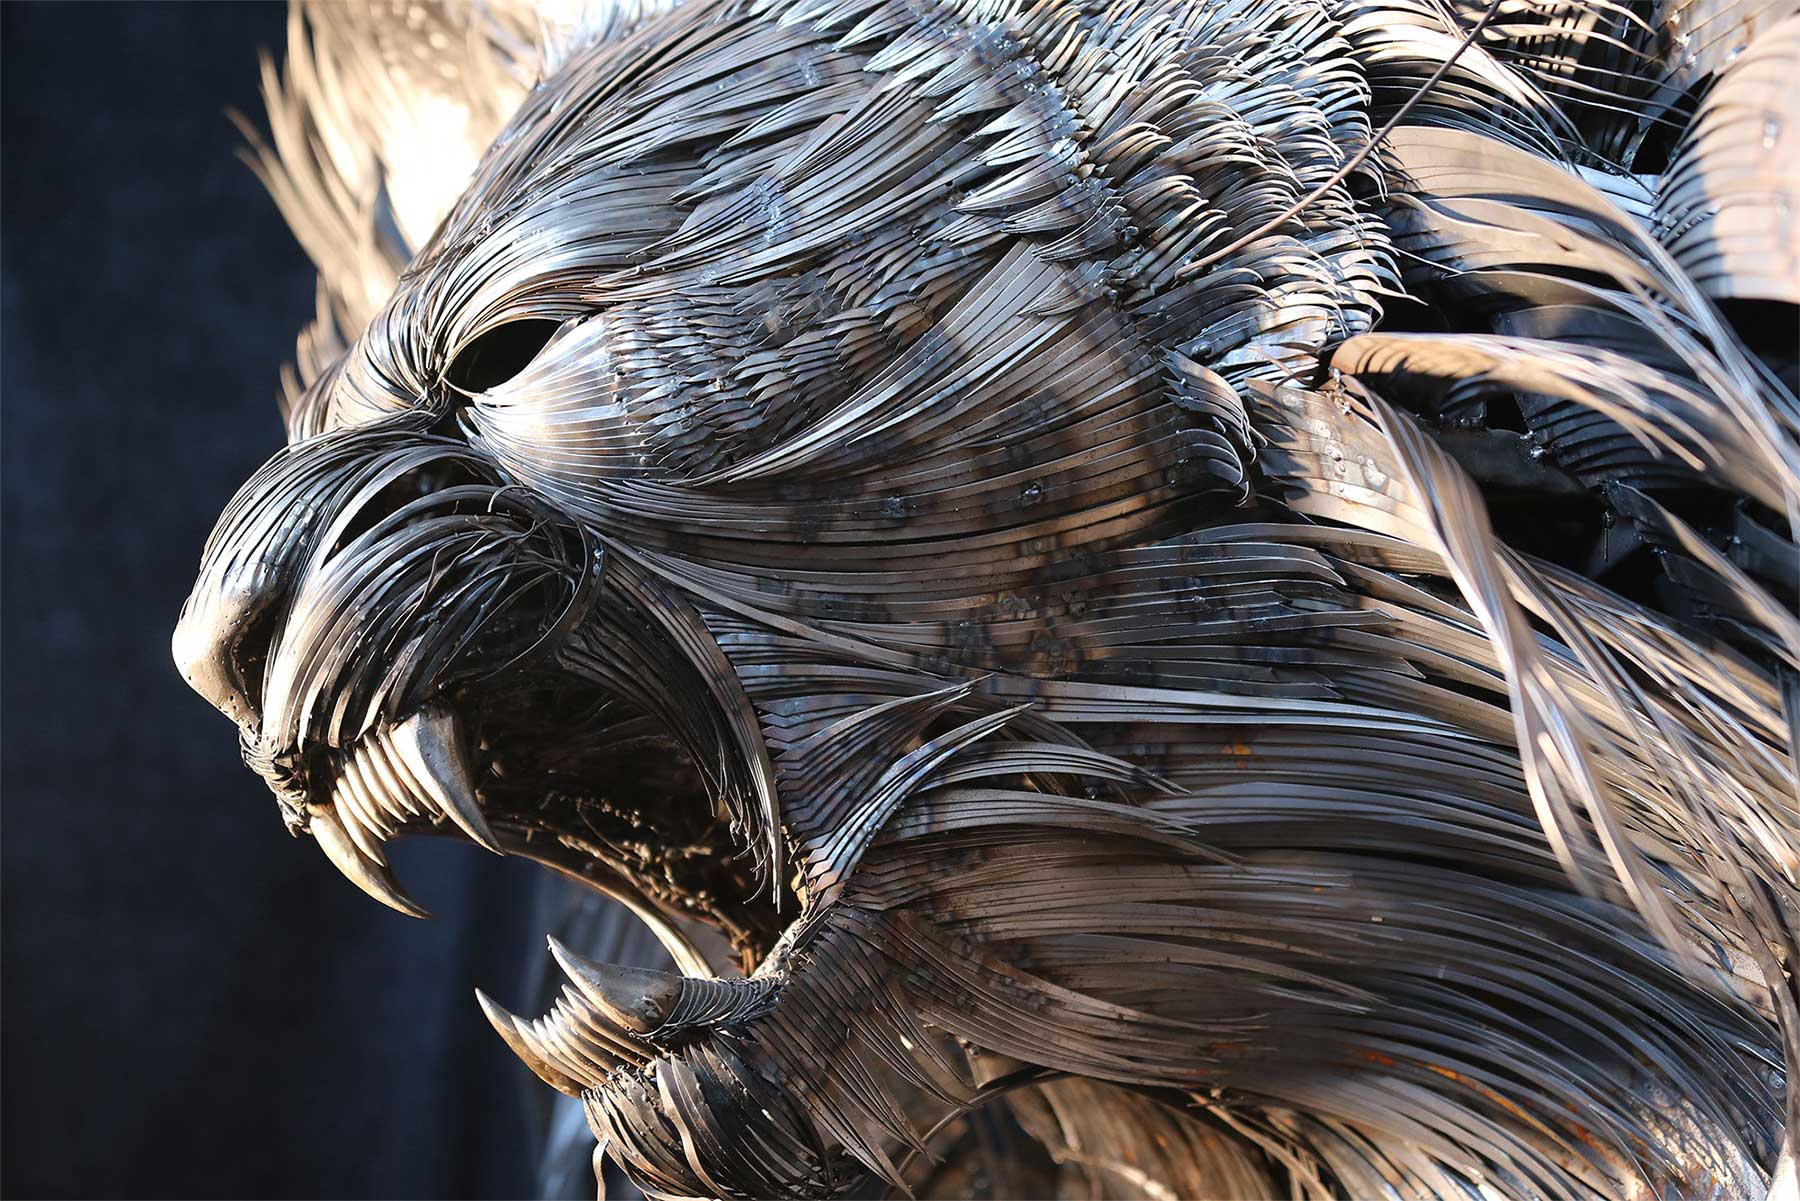 Geniale Altmetall-Skulpturen von Selçuk Yılmaz selcuk-yilmaz-metallskulpturen-2020_03